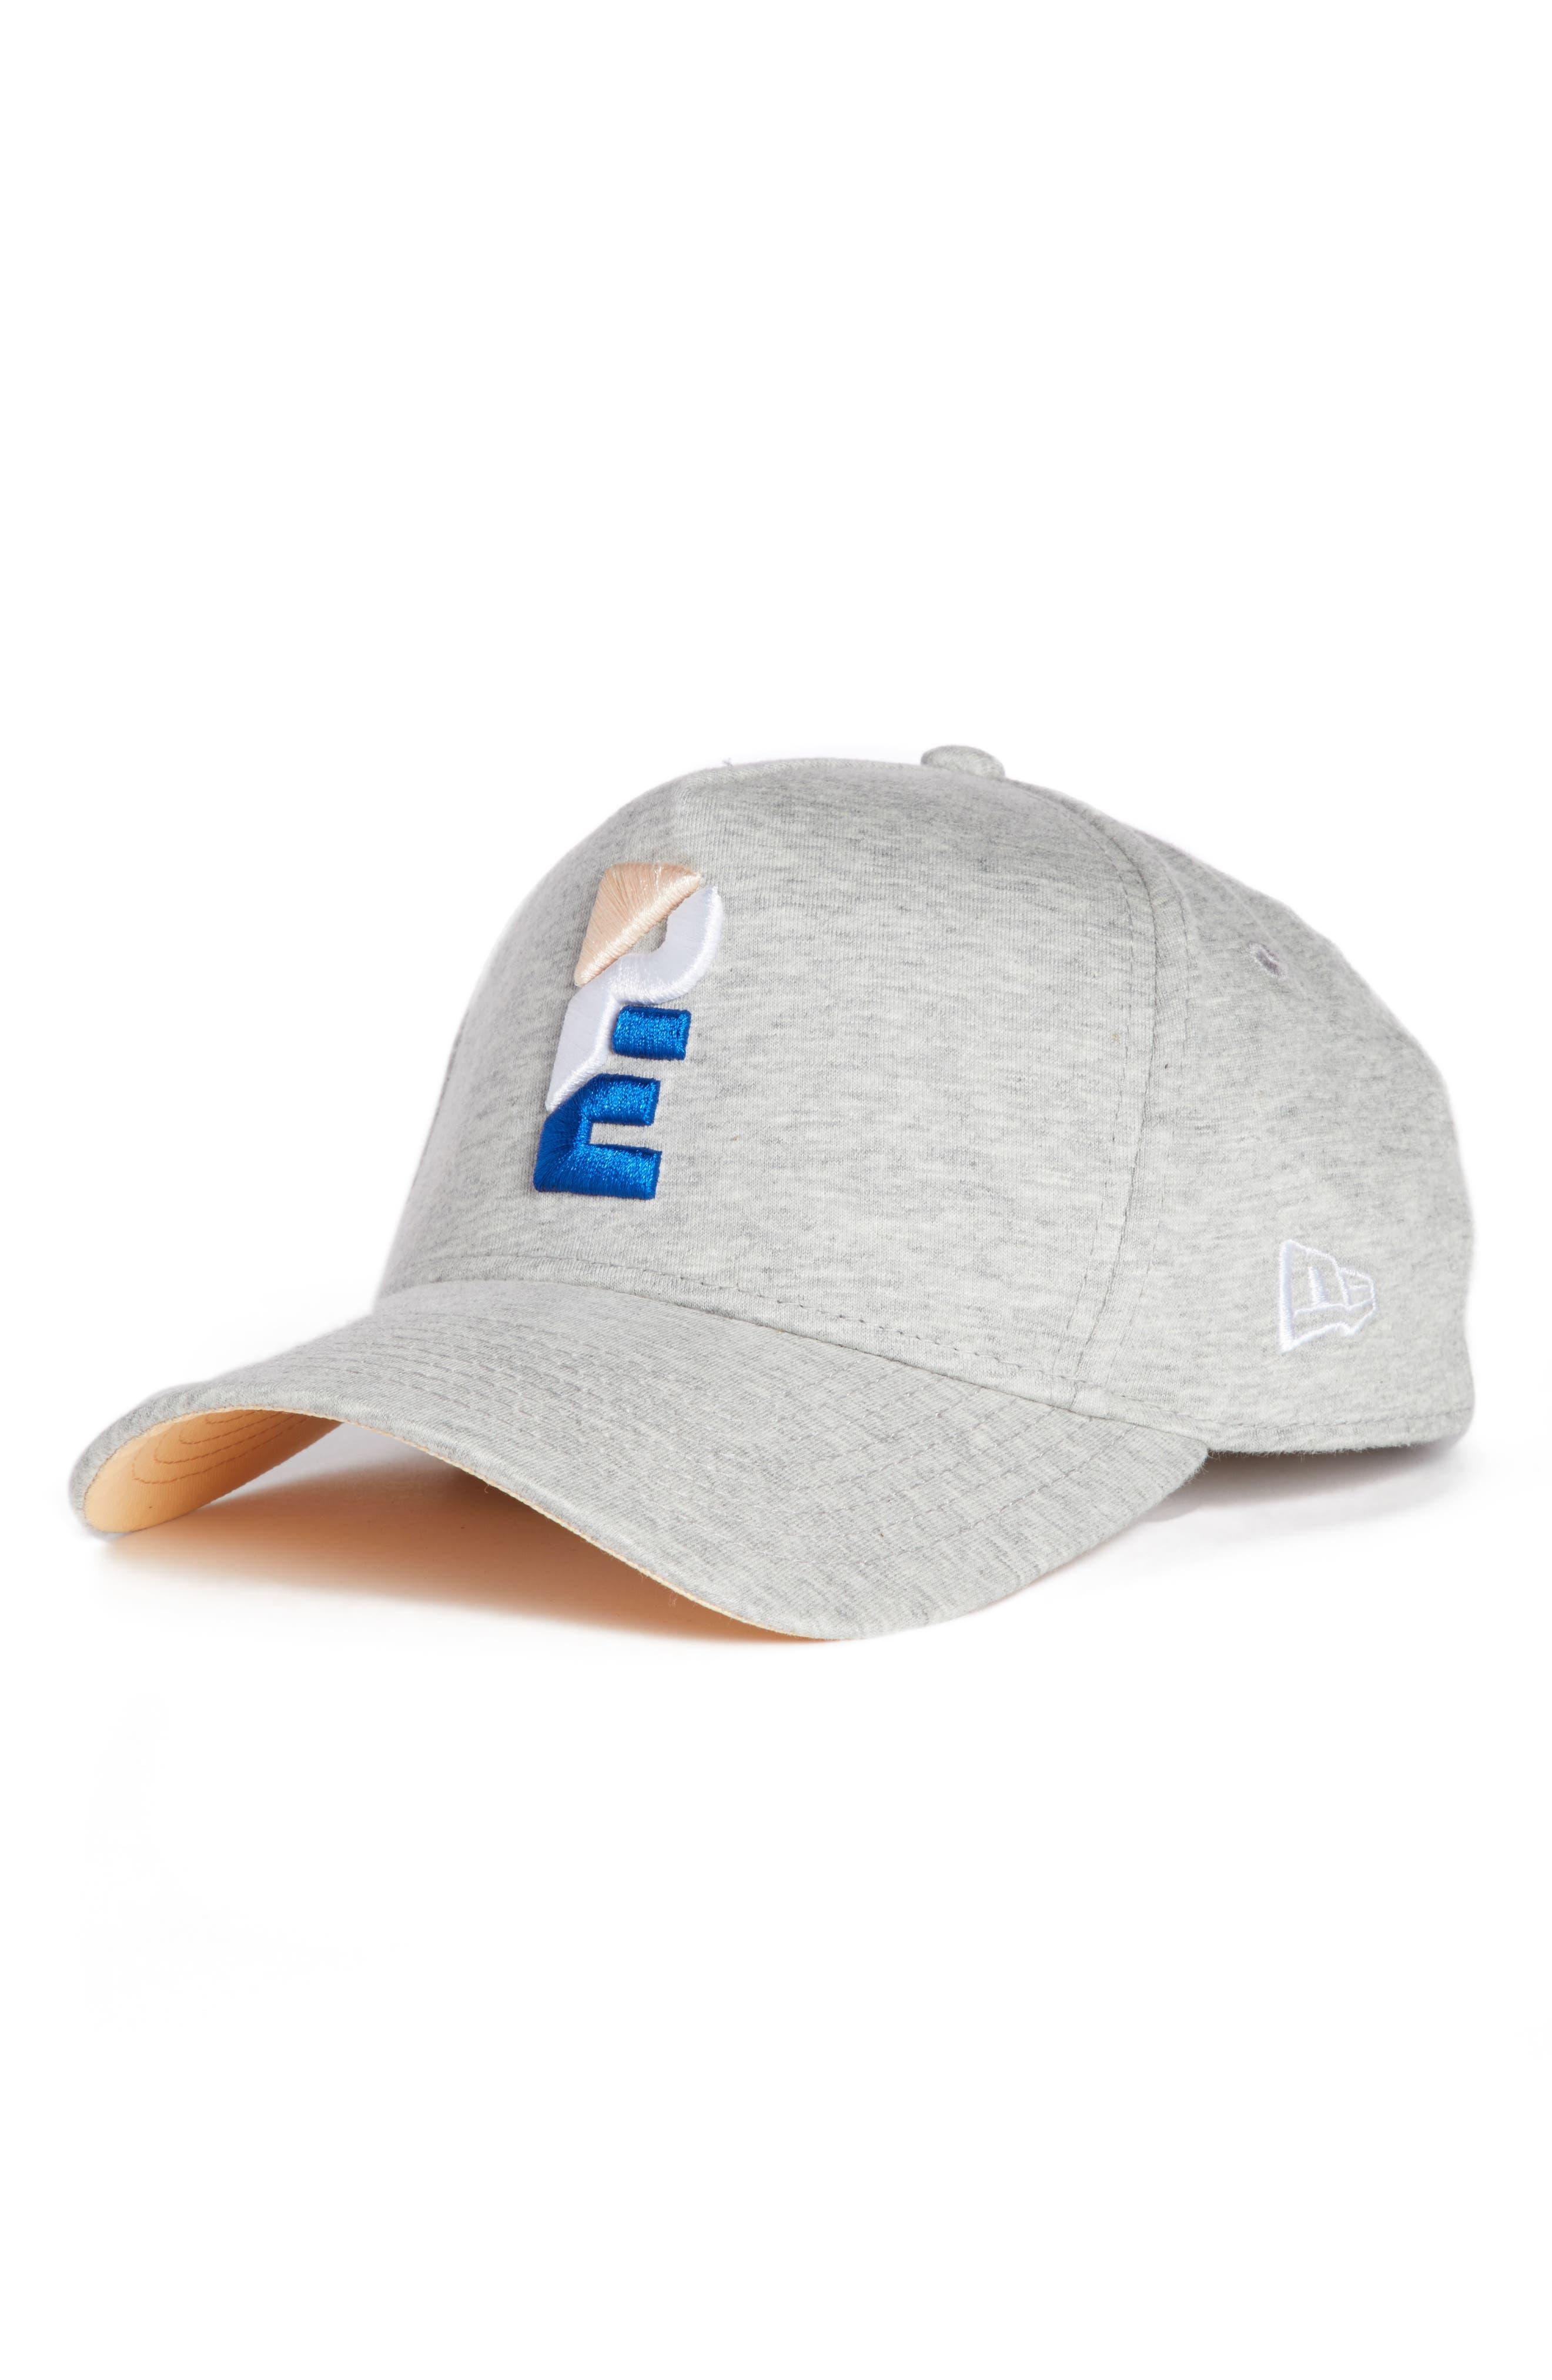 P.E Nation New Era Cap